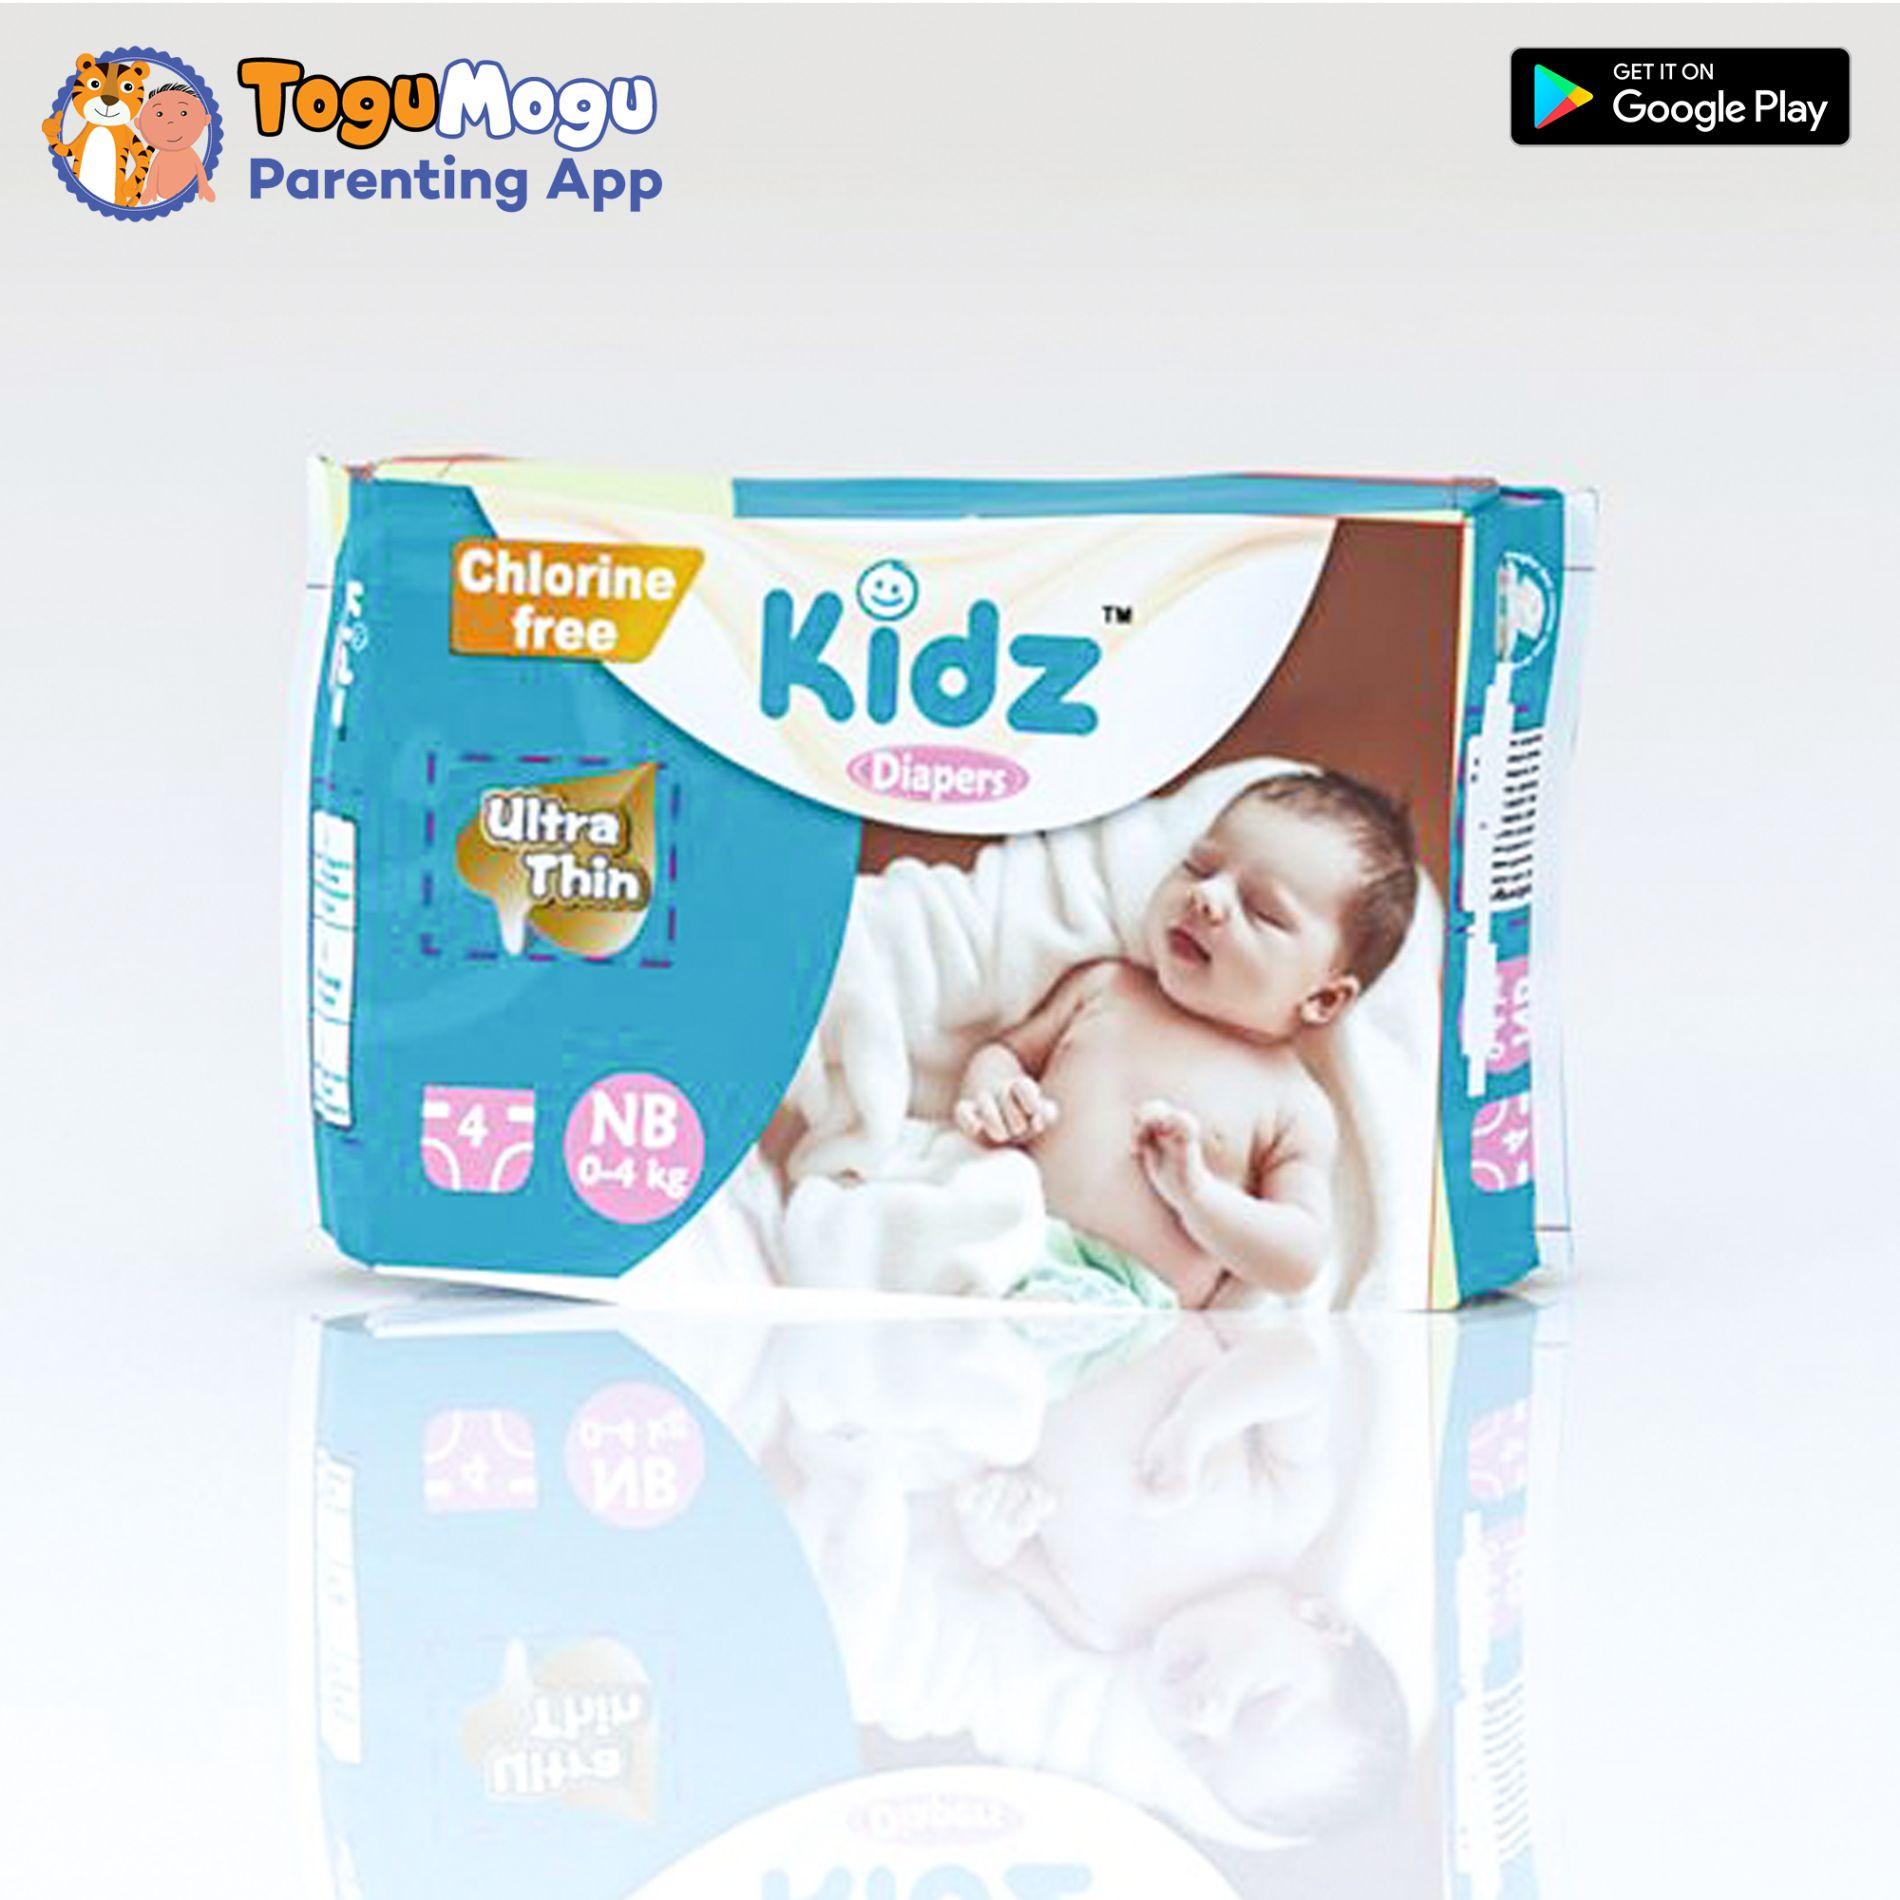 Kidz Diapers NB (0-4kg) 4pcs